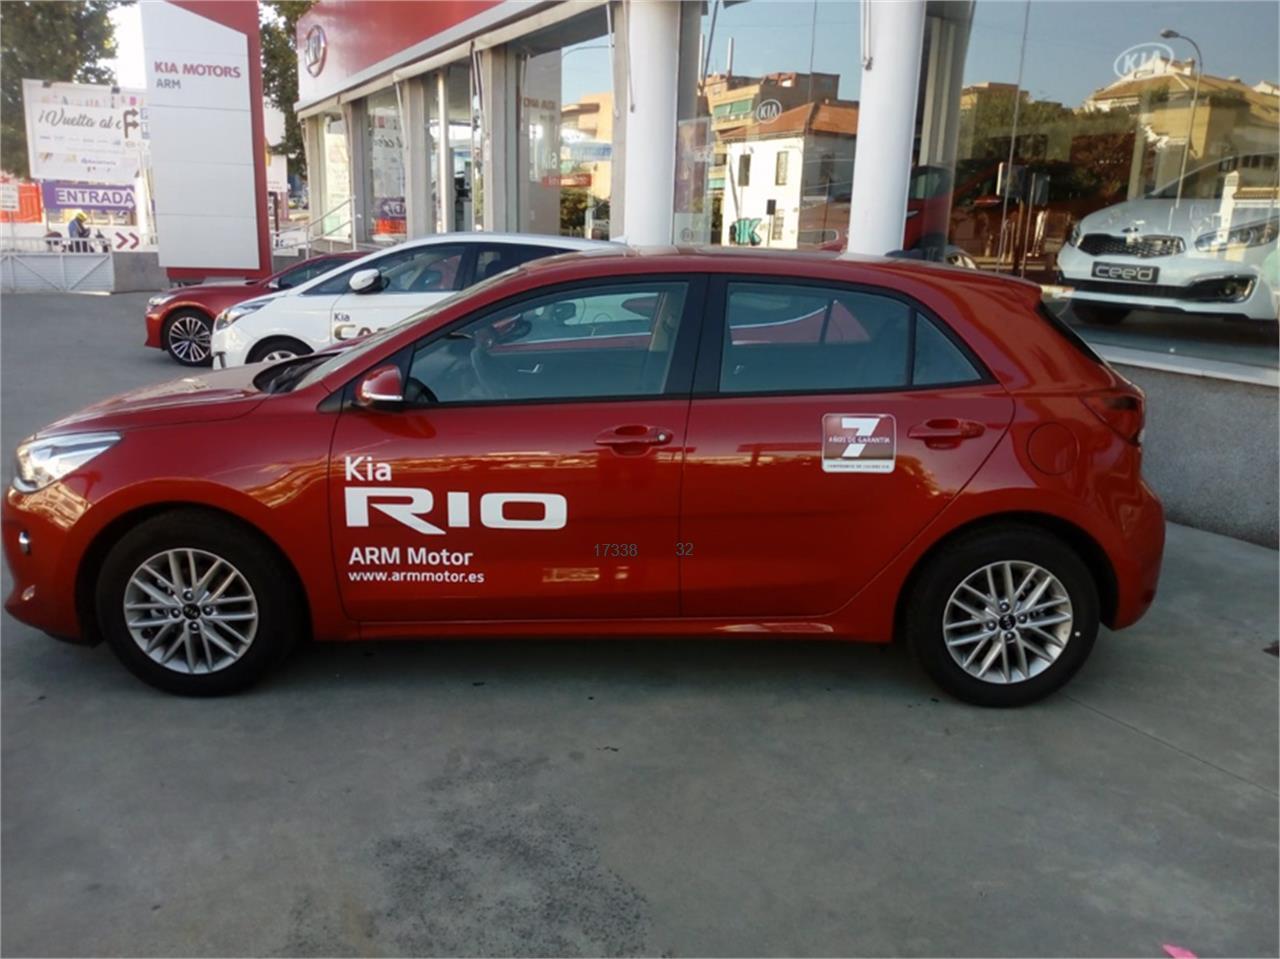 KIA Rio de venta de venta por 12750